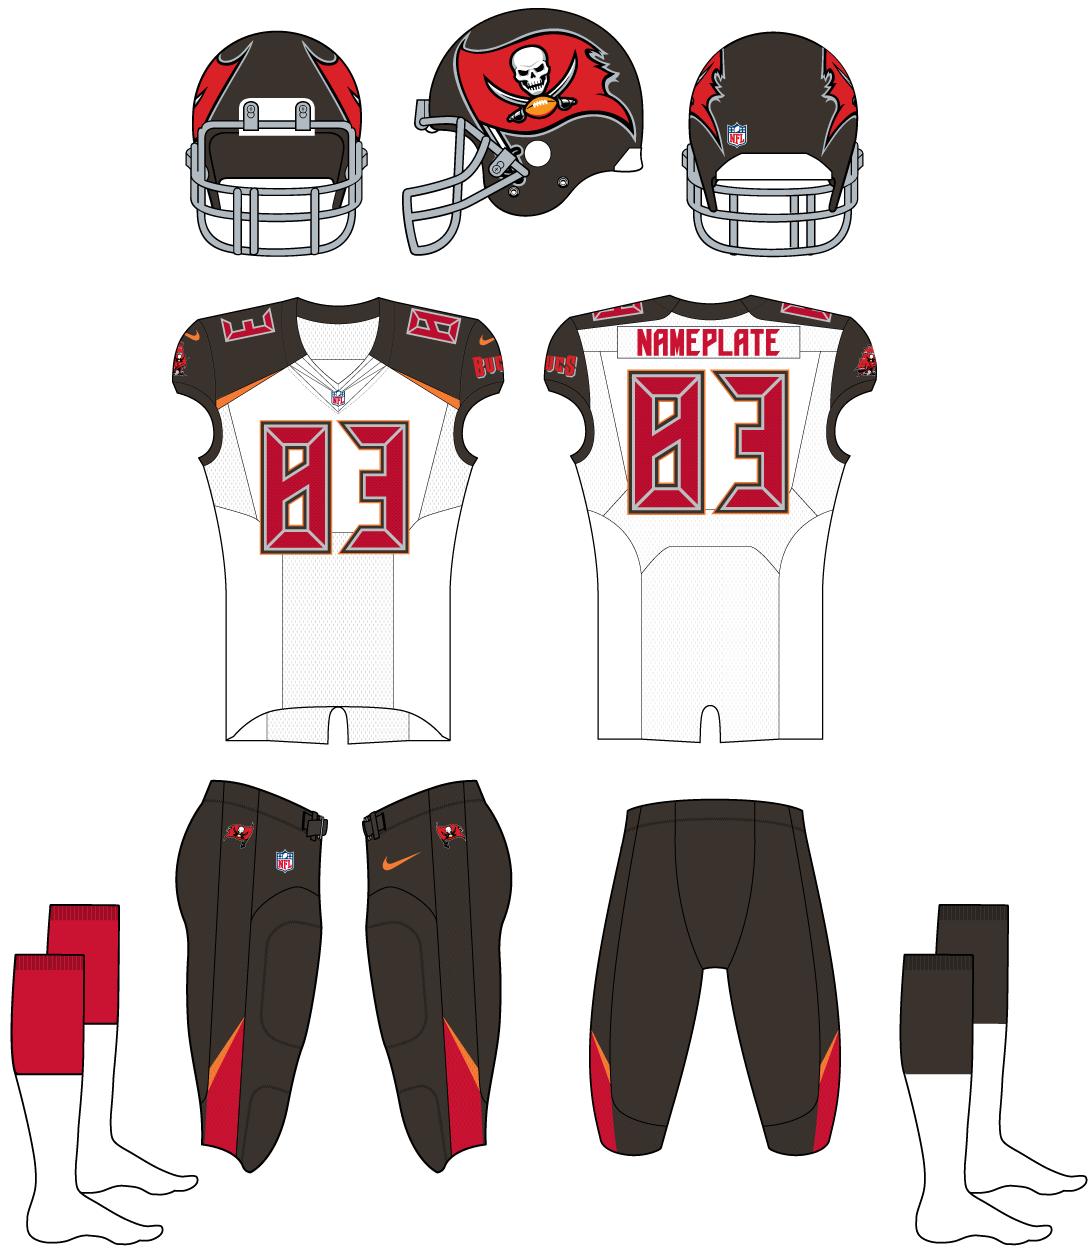 Tampa Bay Buccaneers Uniform Road Uniform (2014-2019) -  SportsLogos.Net